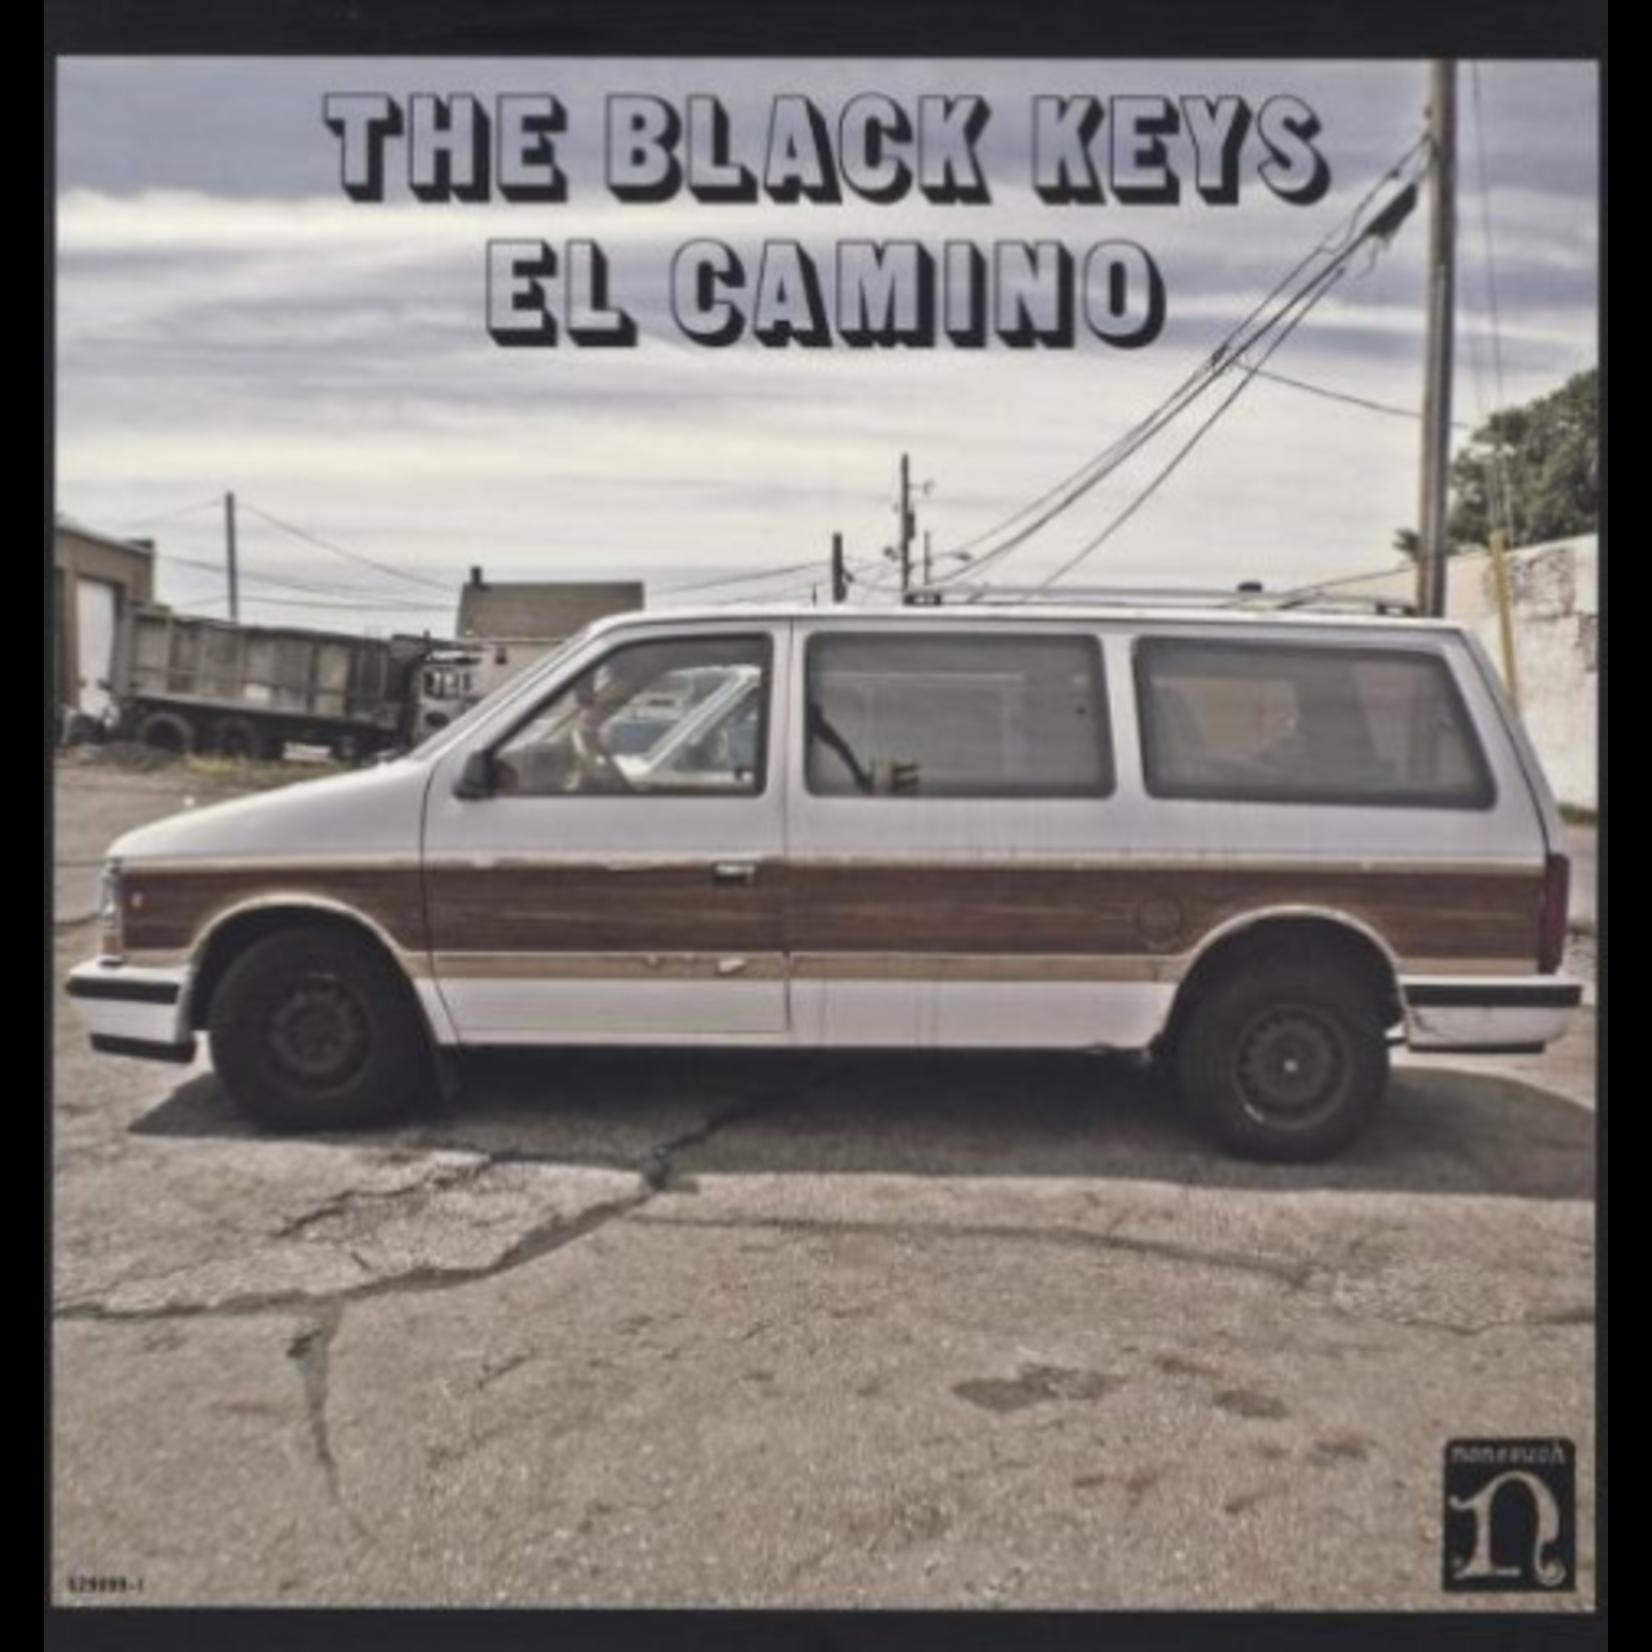 THE BLACK KEYS EL CAMINO (LP/CD)